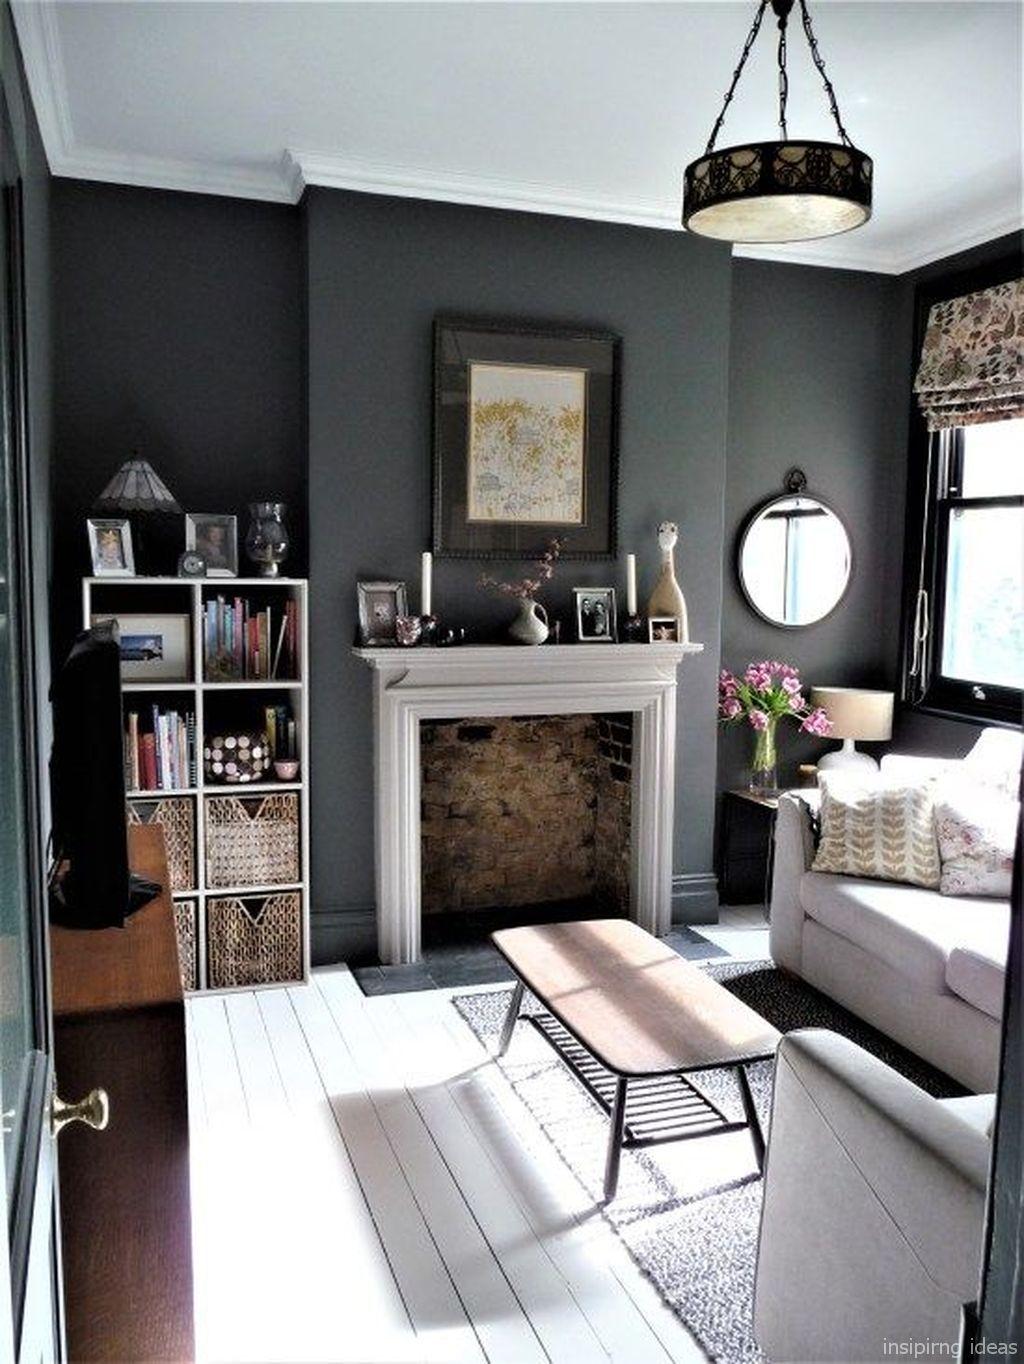 Nice 70 Modern Gray Living Room Decorating Ideas Https Roomaholic Com 5279 70 Modern Gray Living R Moody Living Room Dark Living Rooms Grey Walls Living Room